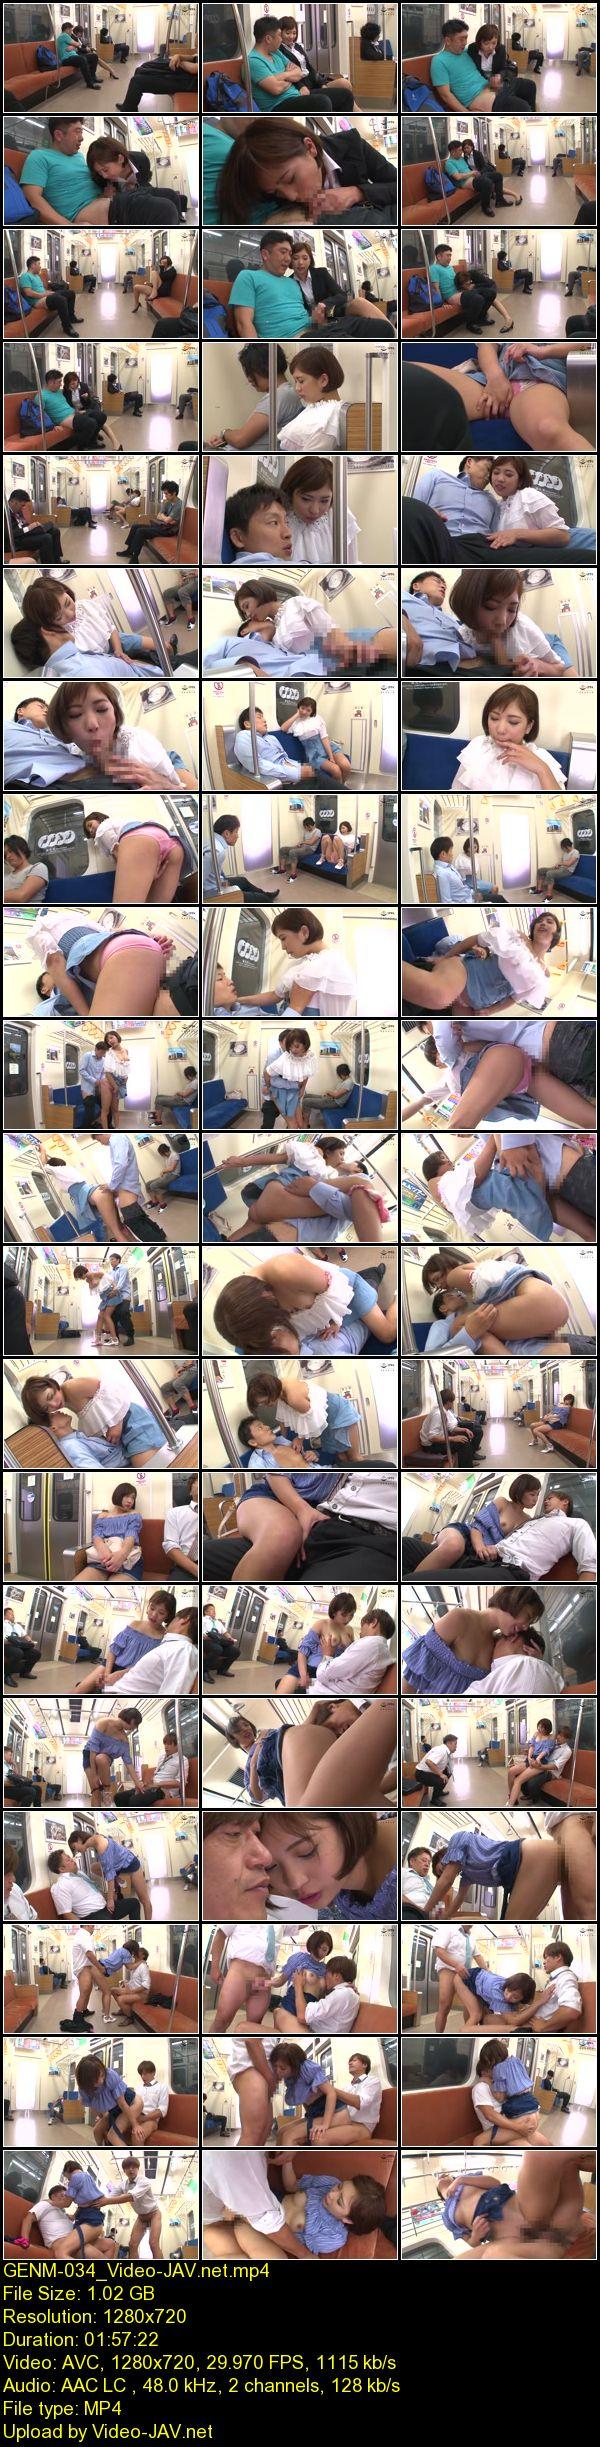 JAV Download Mari Takasugi [GENM 034] 終電車で男を誘惑して味見 高杉麻里 痴女 Pervert 2020 03 25